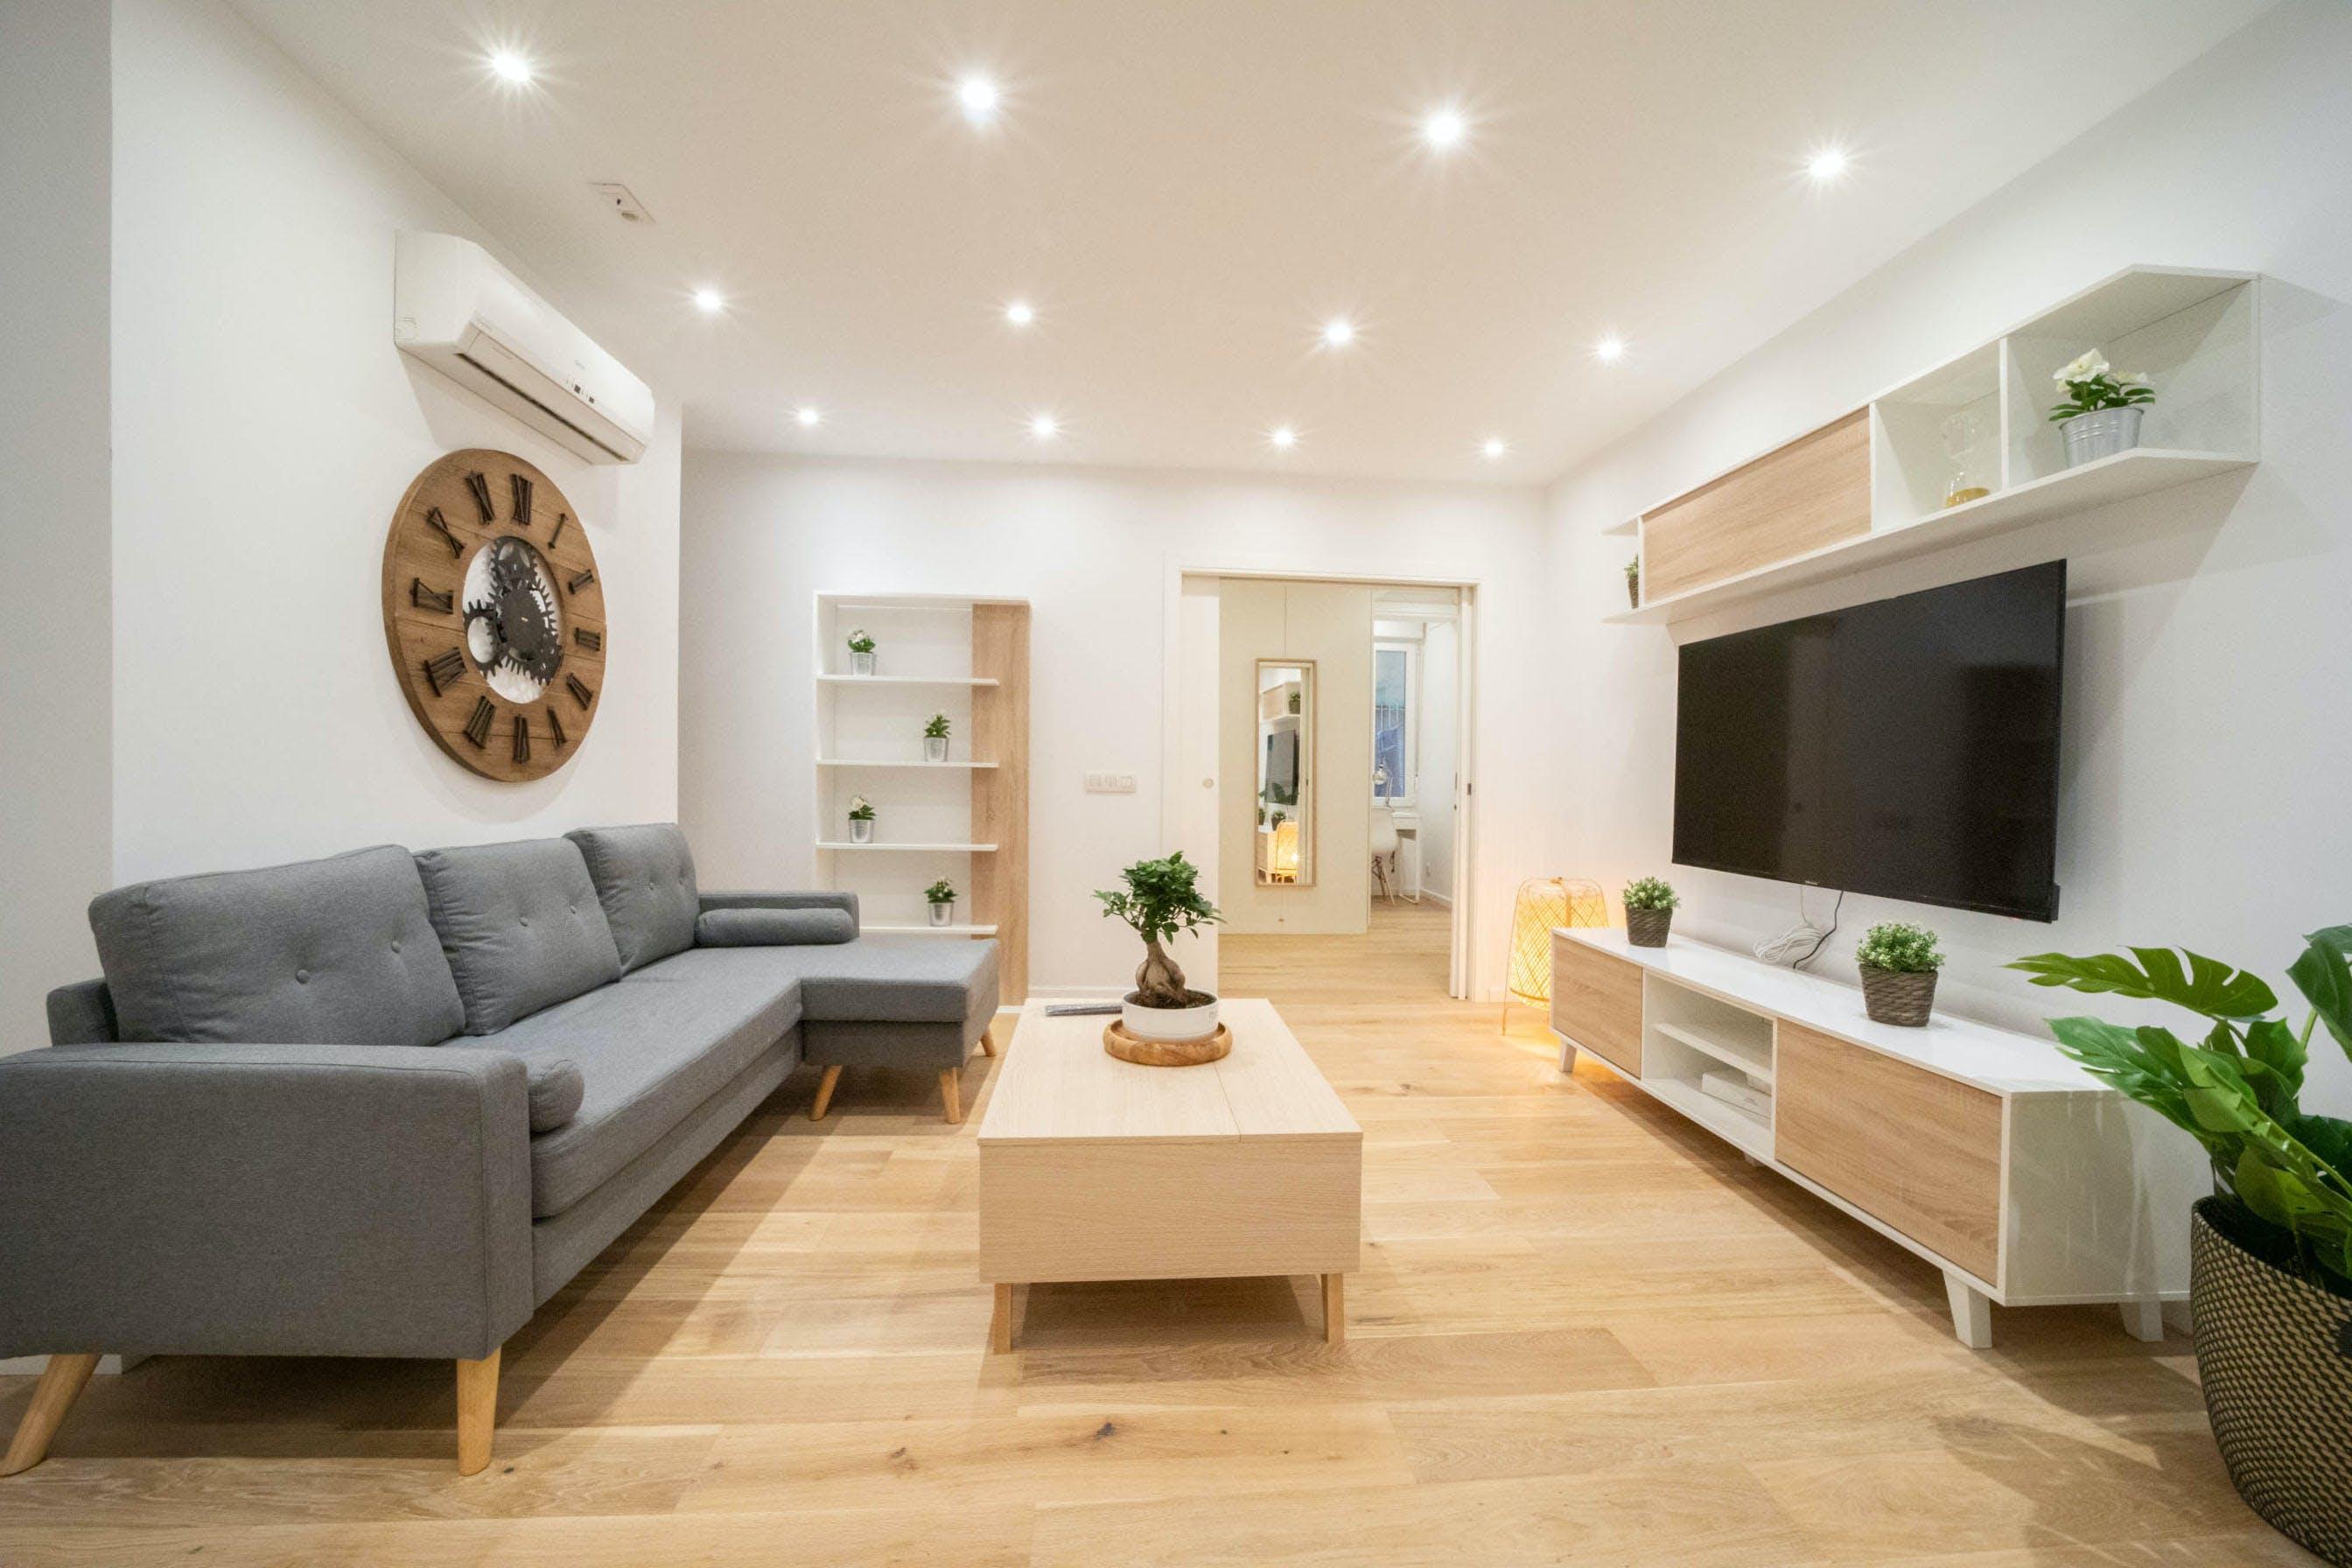 7 Residents   Gaztambide - Chamberí   Stunning Stylish Apt. w/ Large Workspace